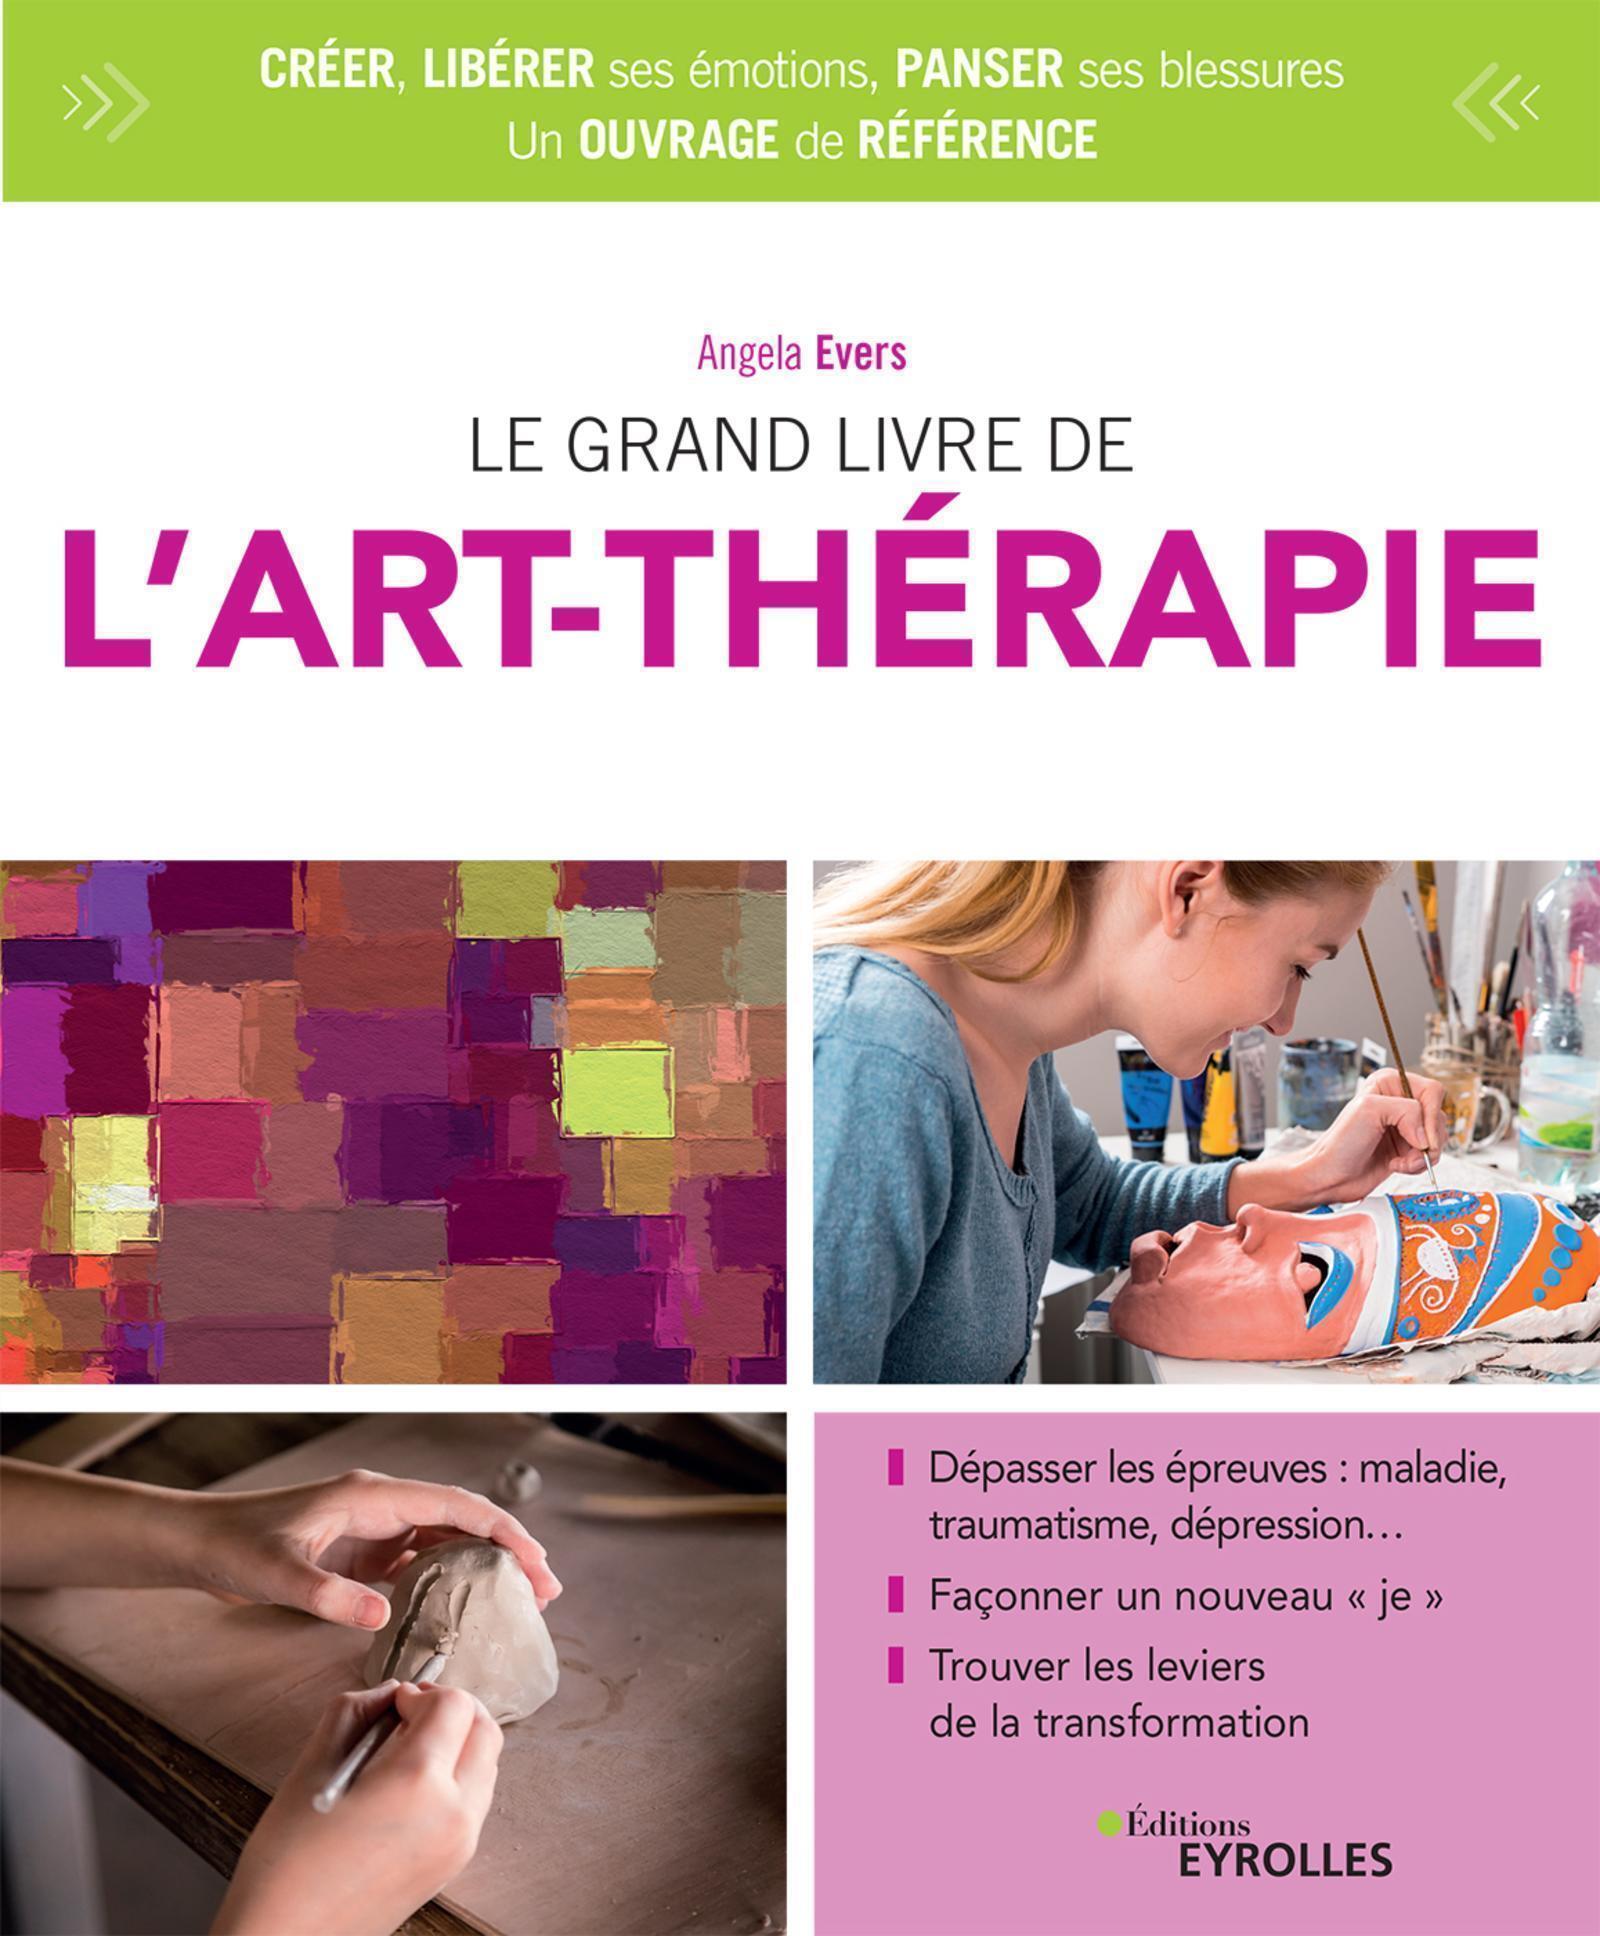 LE GRAND LIVRE DE L'ART-THERAPIE - DEPASSER LES EPREUVES : MALADIE, TRAUMATISME, DEPRESSION... FACON